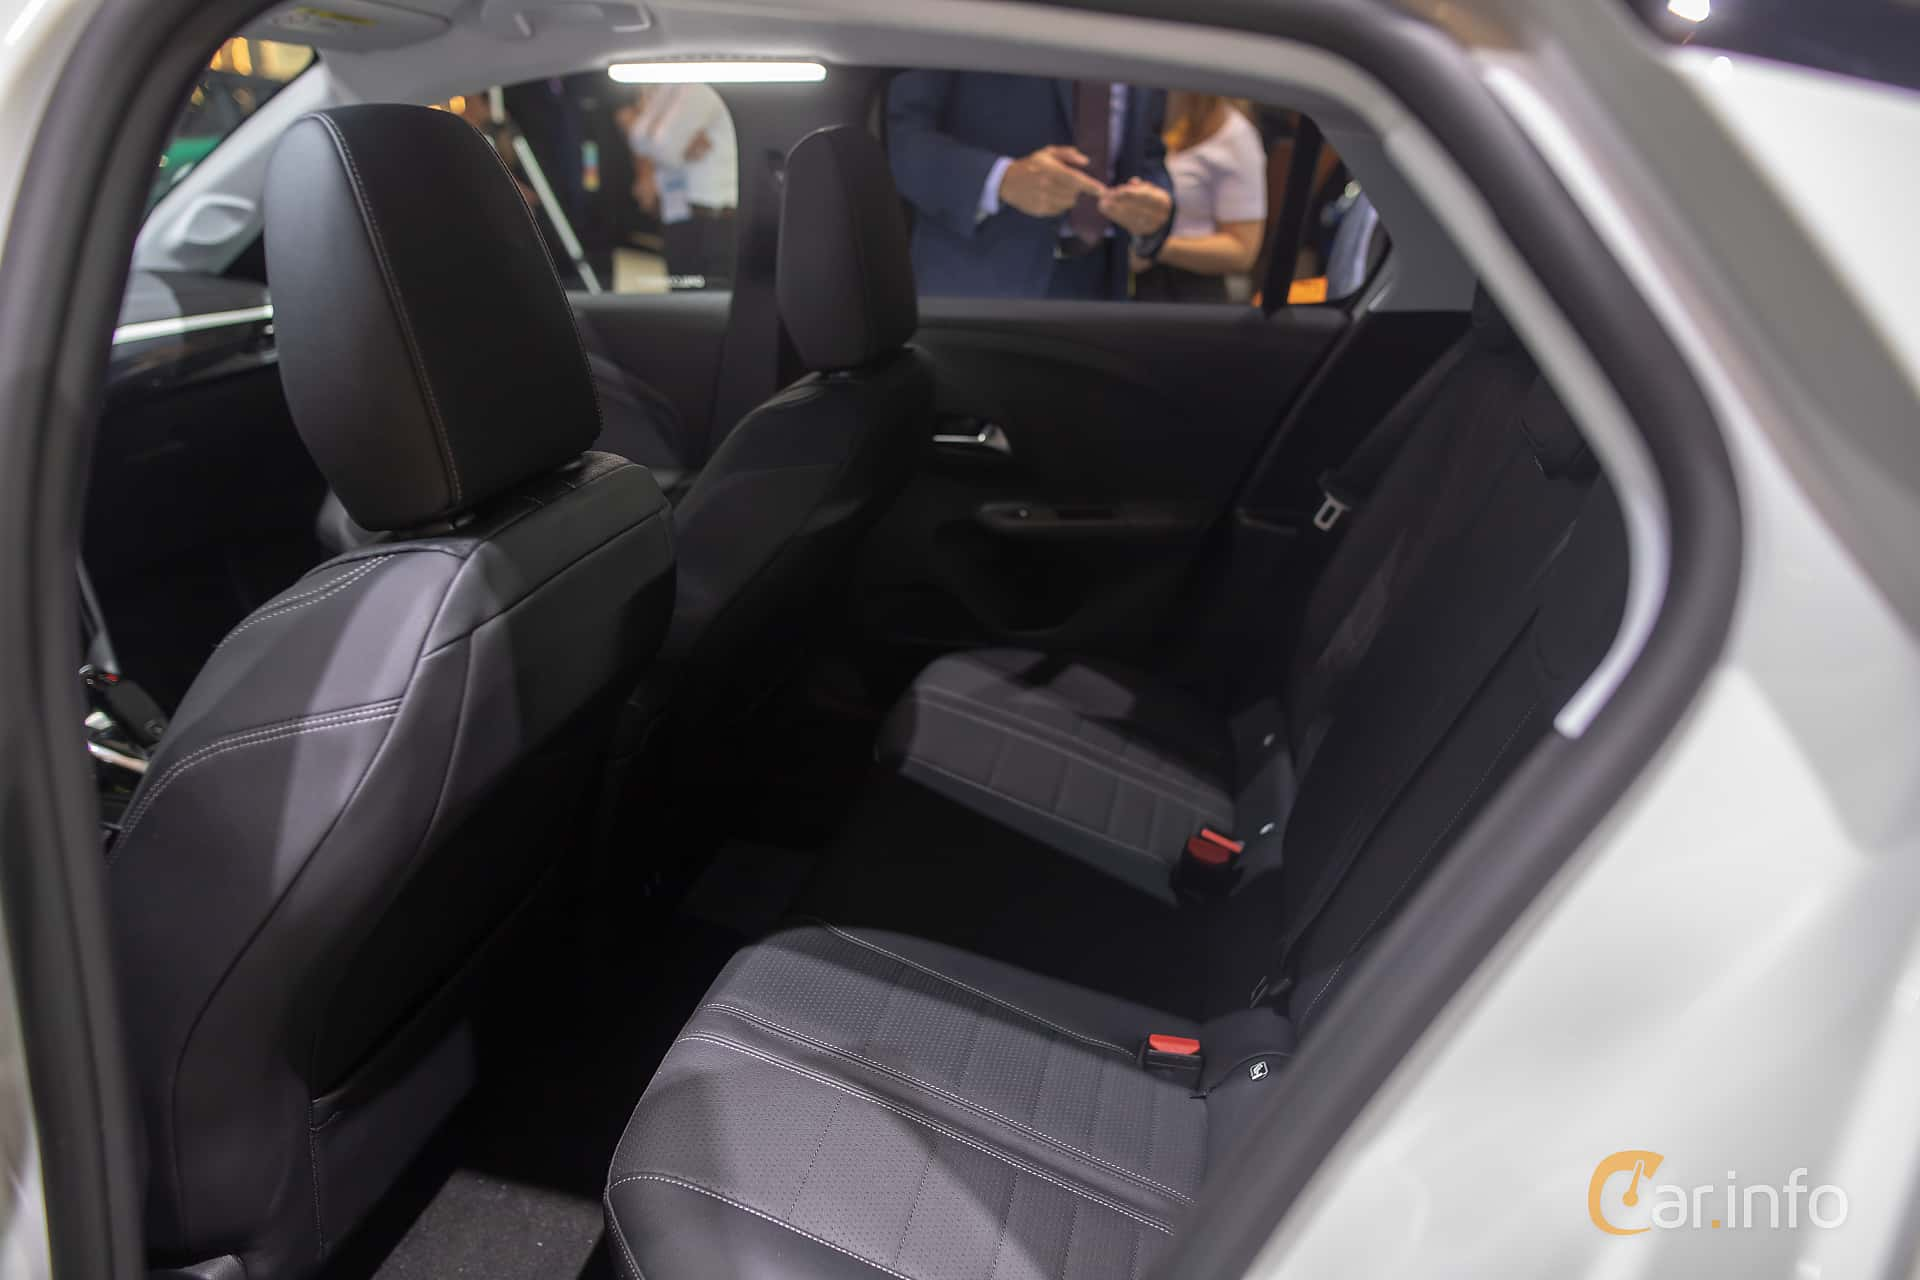 Interior of Opel Corsa 1.2 Turbo Automatic, 100ps, 2020 at IAA 2019